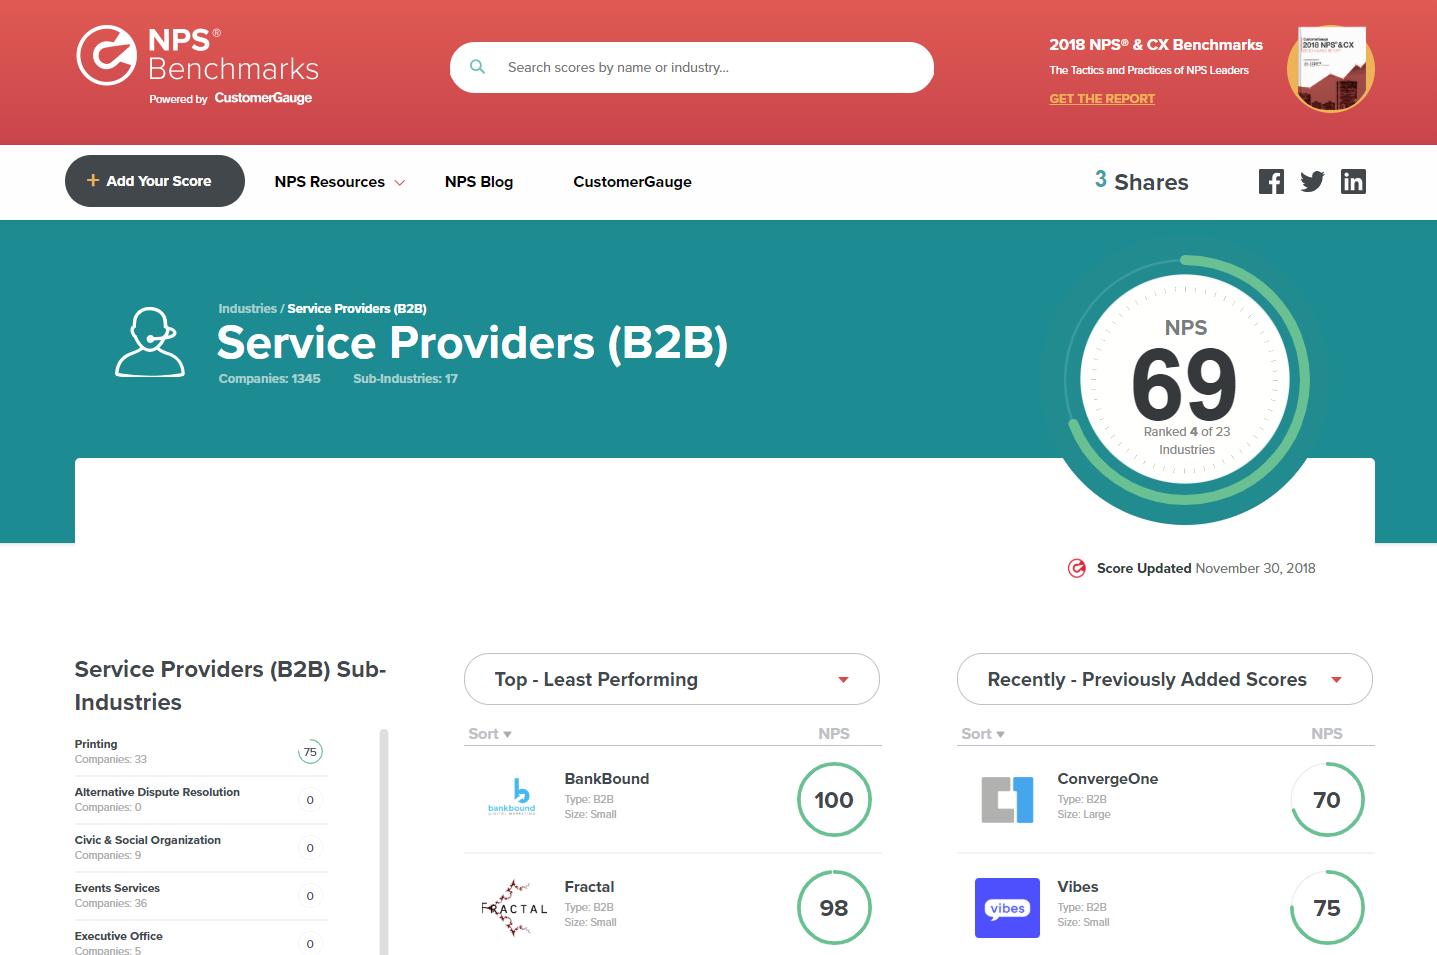 Net Promoter Score Industry Average